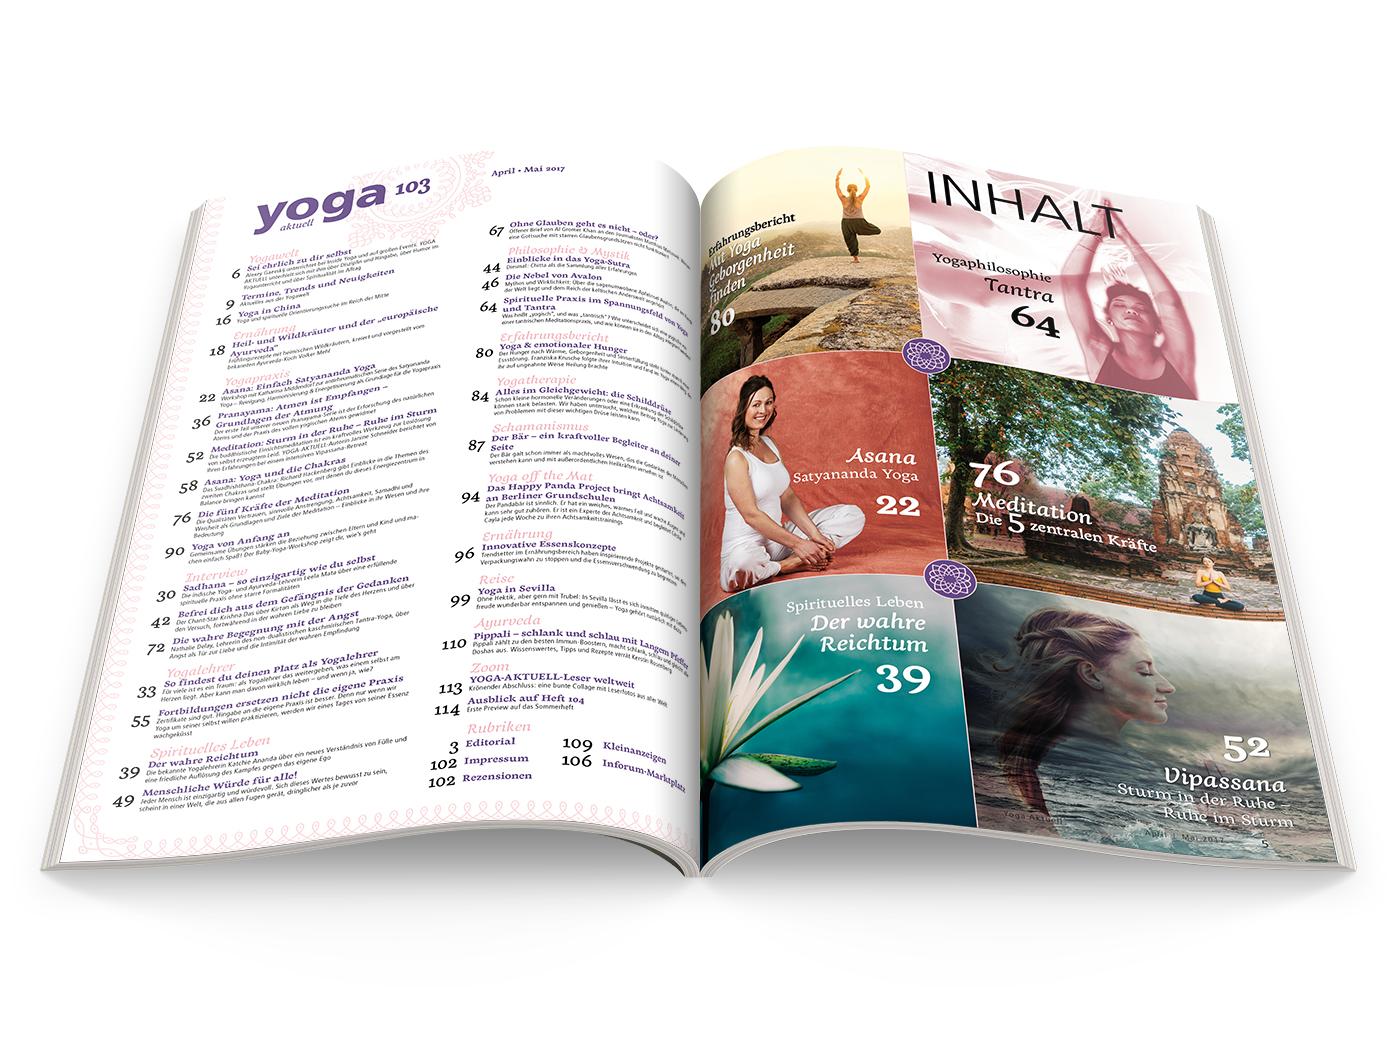 Yoga Aktuell 103 - 02/2017